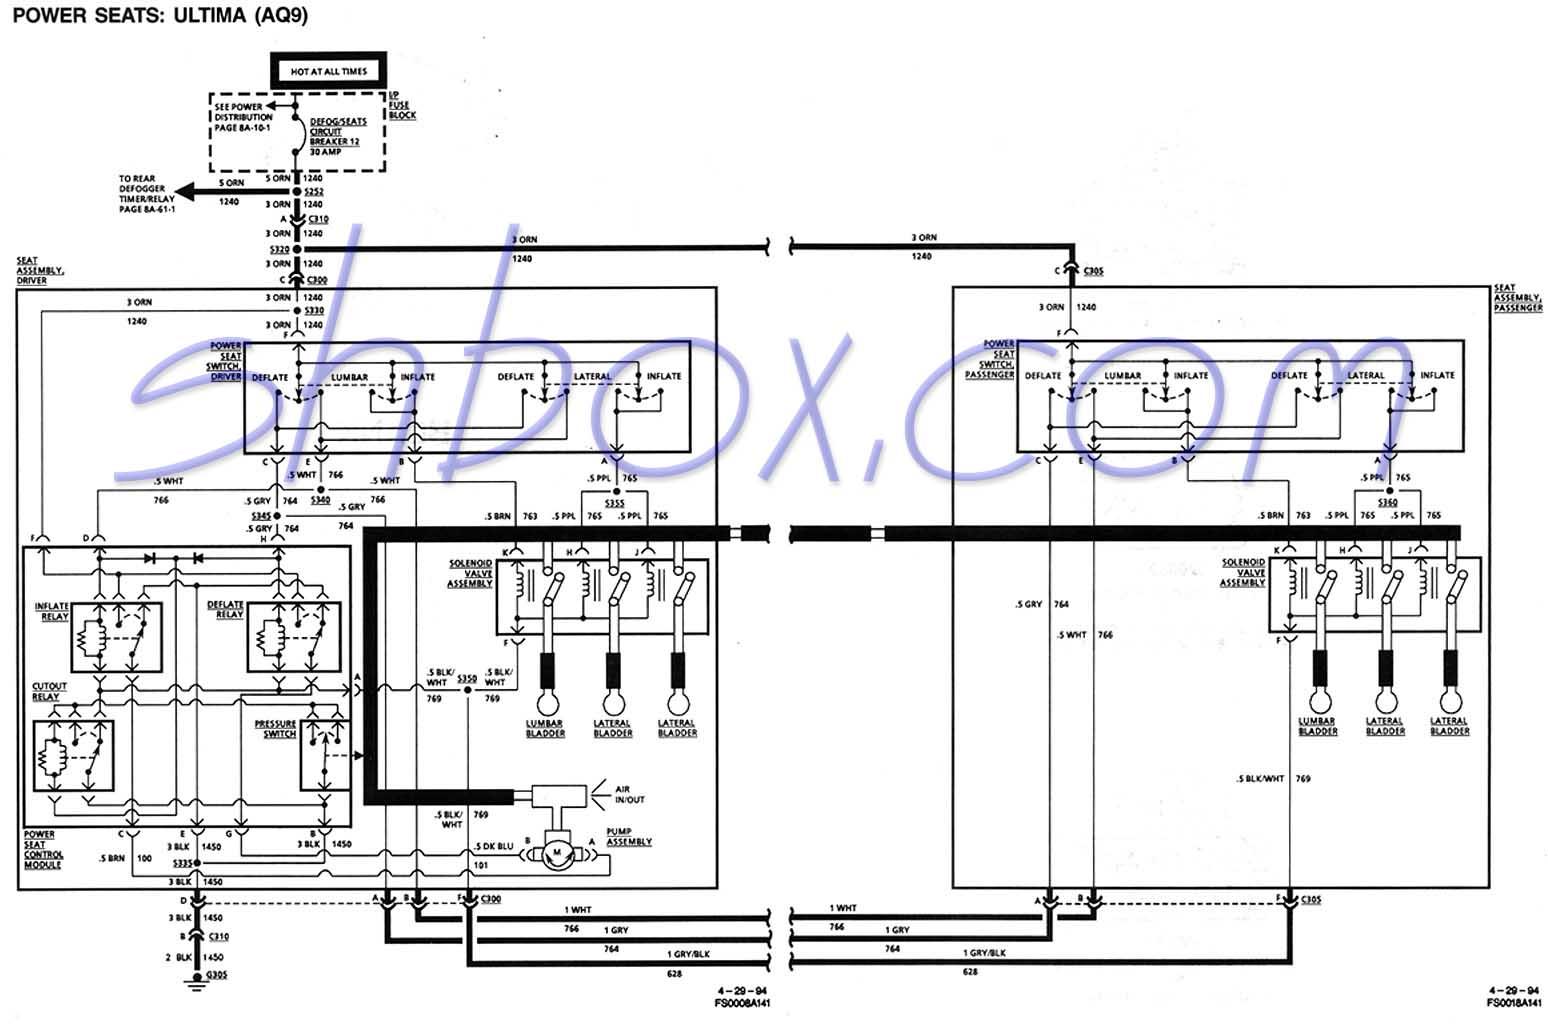 1995 pontiac firebird wiring diagram auto electrical wiring diagram 1995  honda accord wiring diagram 1995 pontiac